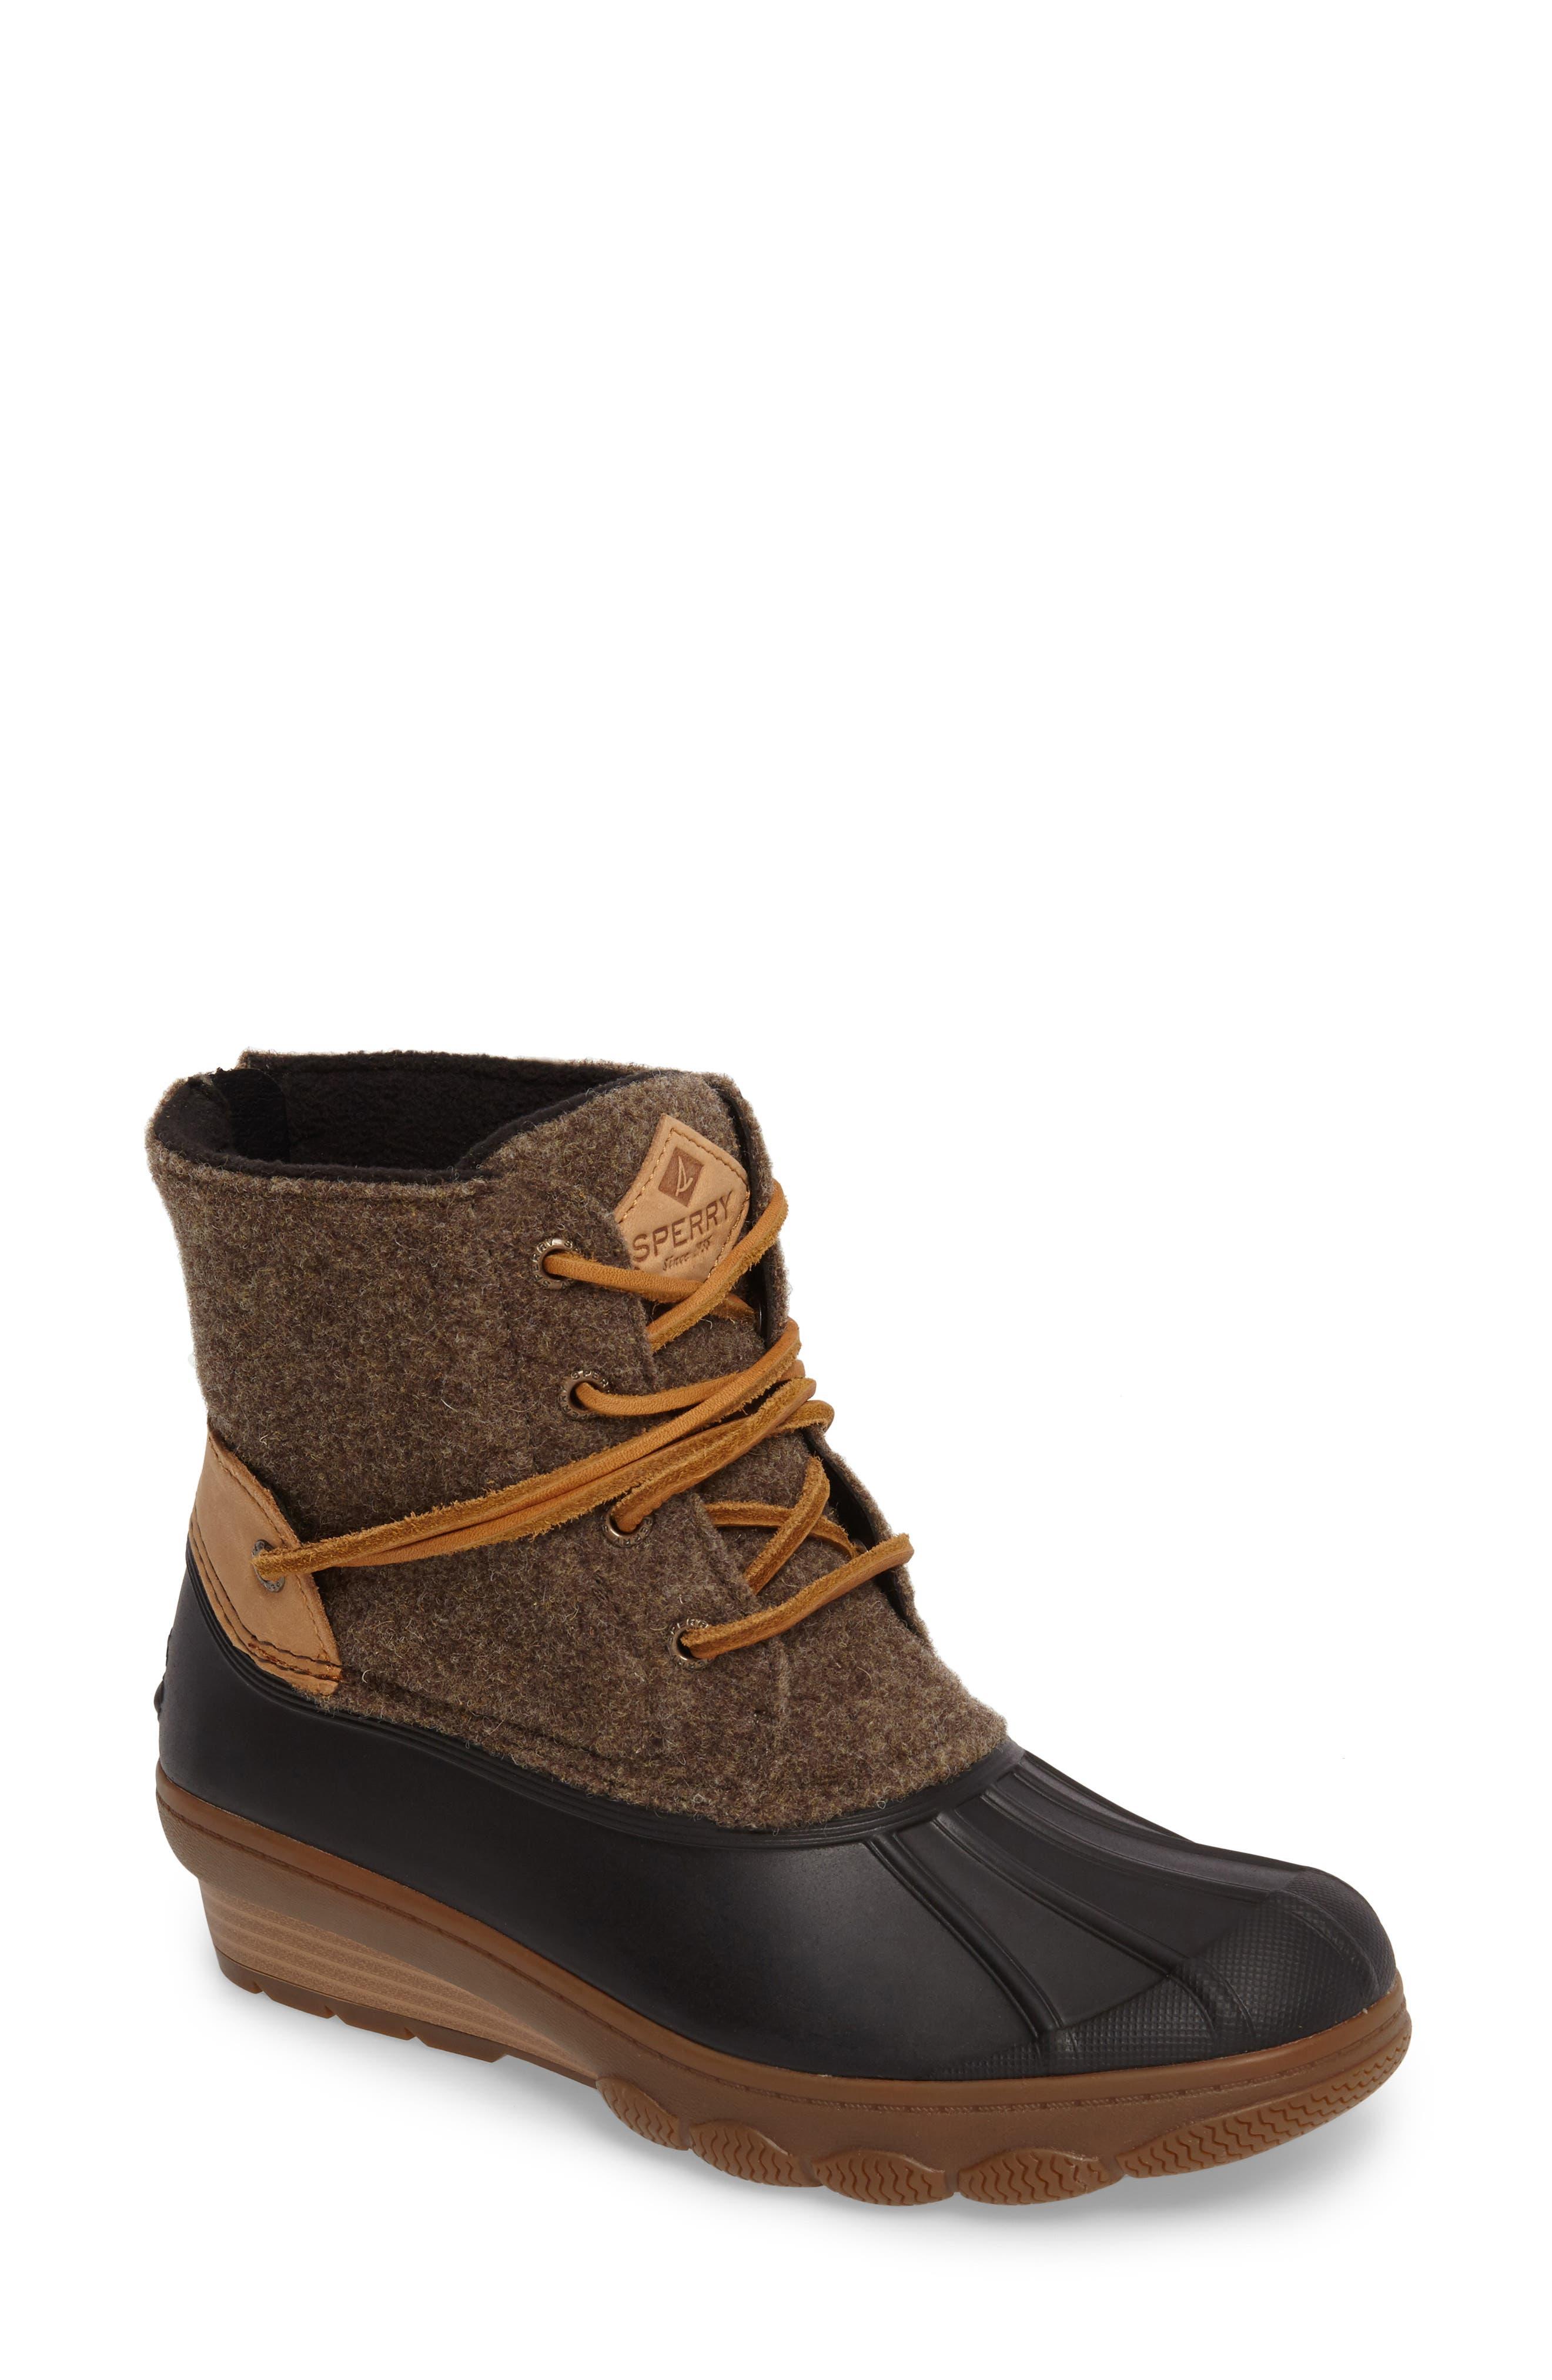 Sperry Saler Tide Wedge Boot Women S Shoes